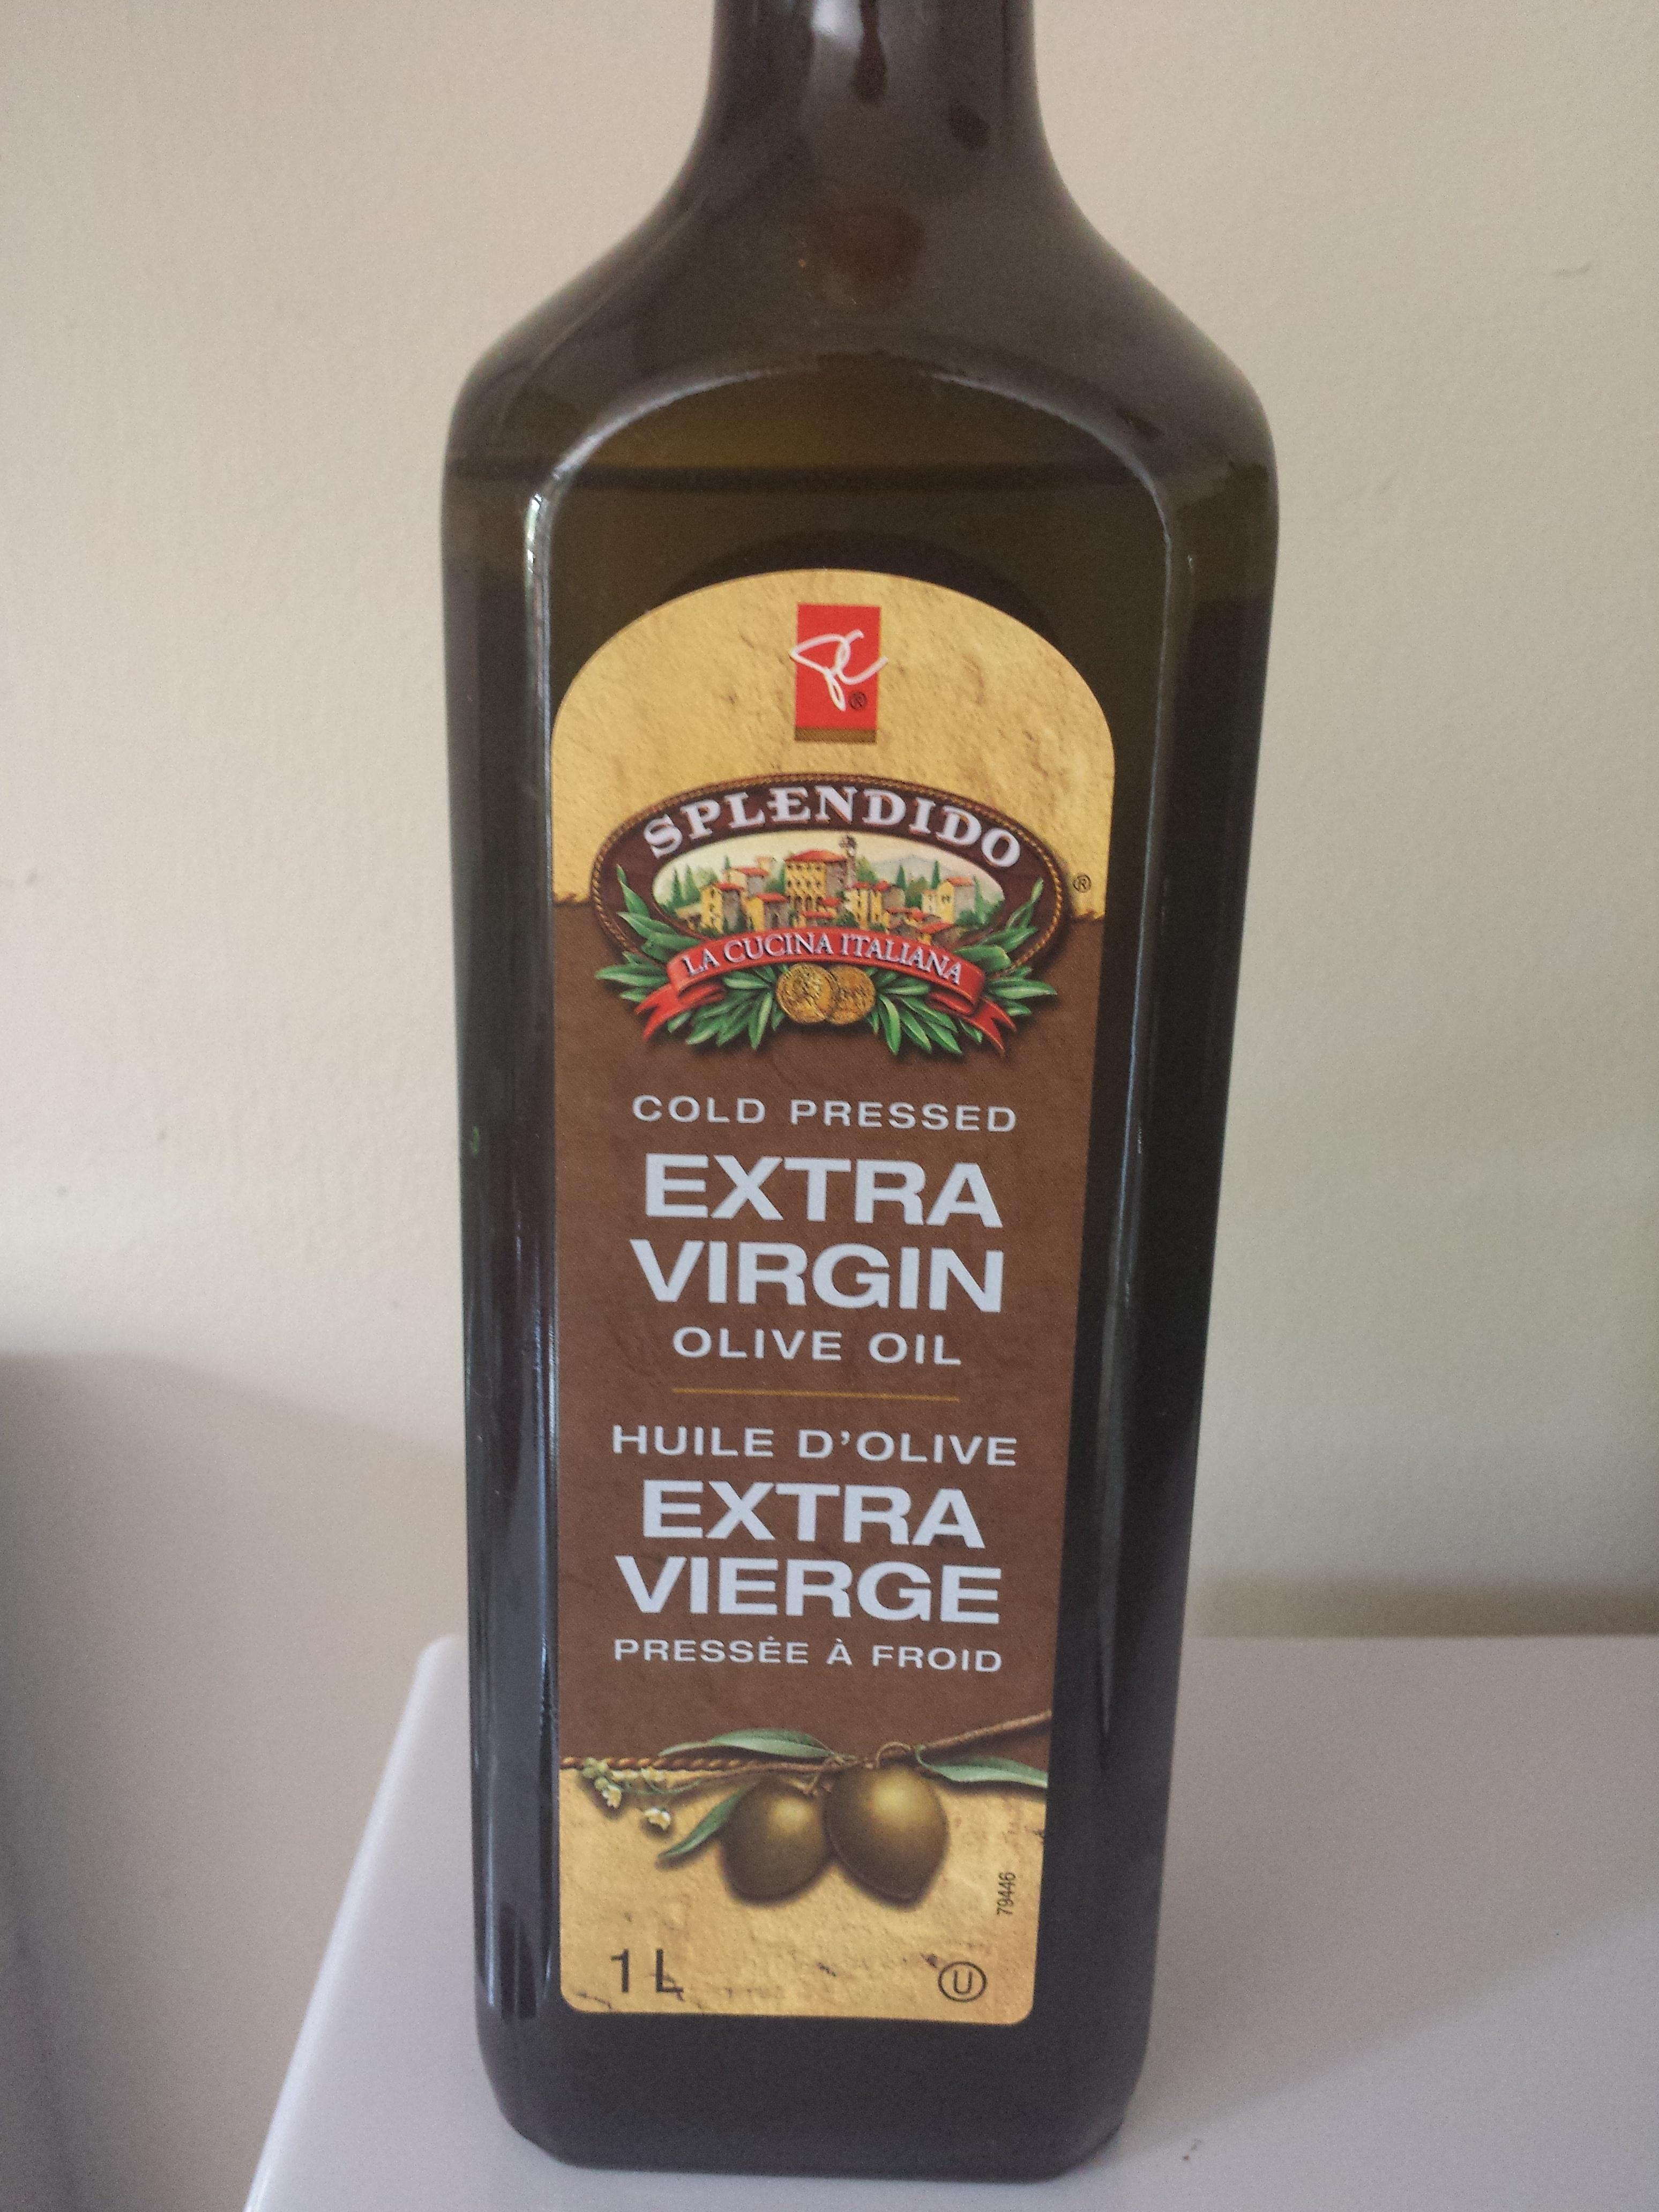 Splendido cold-pressed extra virgin olive oil - Produit